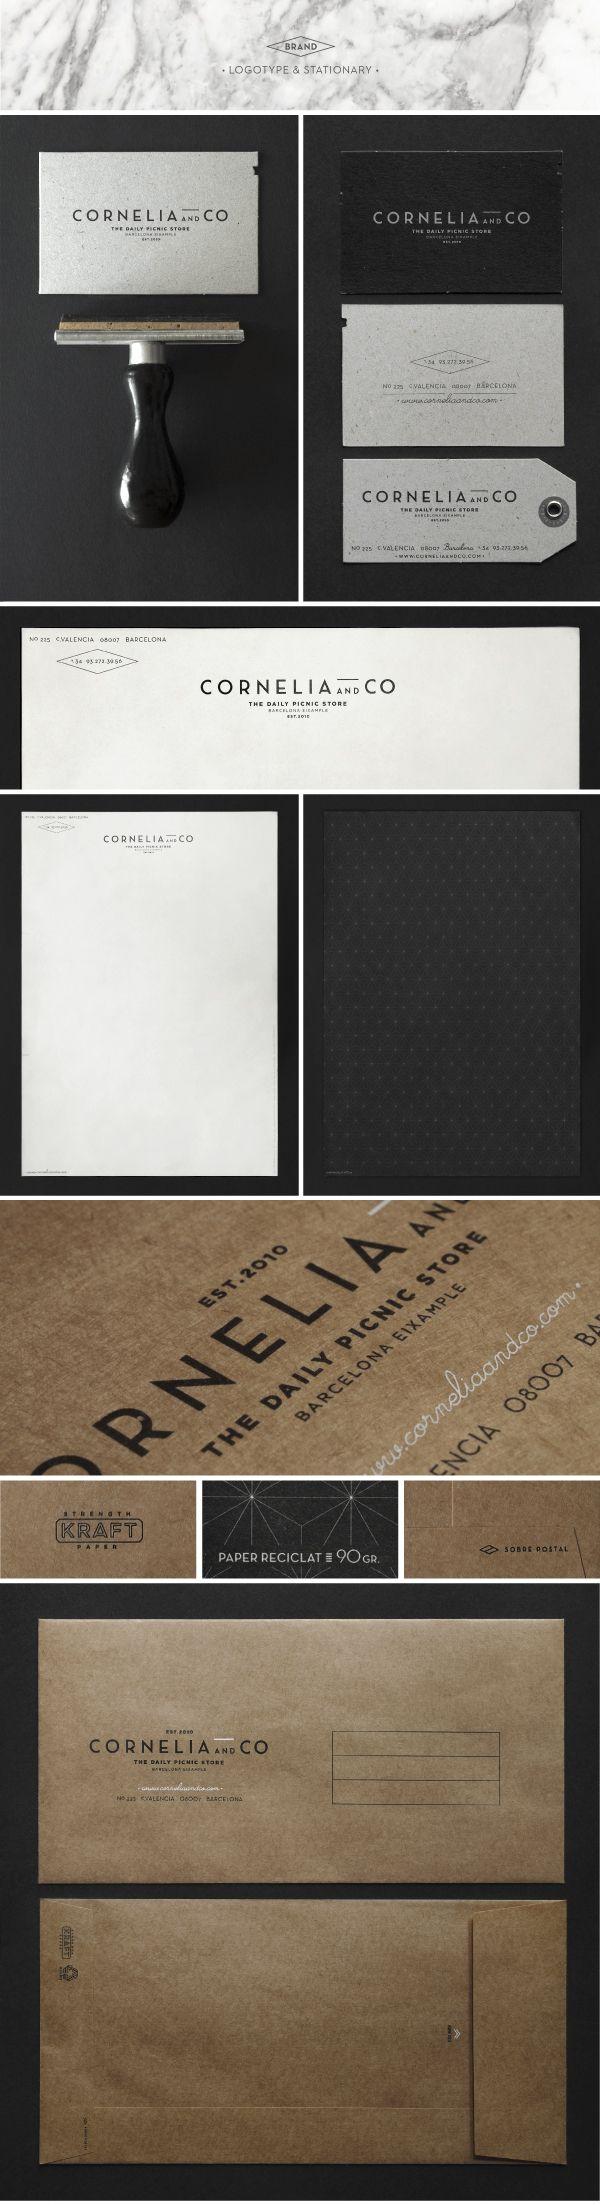 CORNELIA and CO [ Brand identity   #stationary #corporate #design #corporatedesign #identity #branding #marketing repinned by www.BlickeDeeler.de   Visit our website: www.blickedeeler.de/leistungen/corporate-design